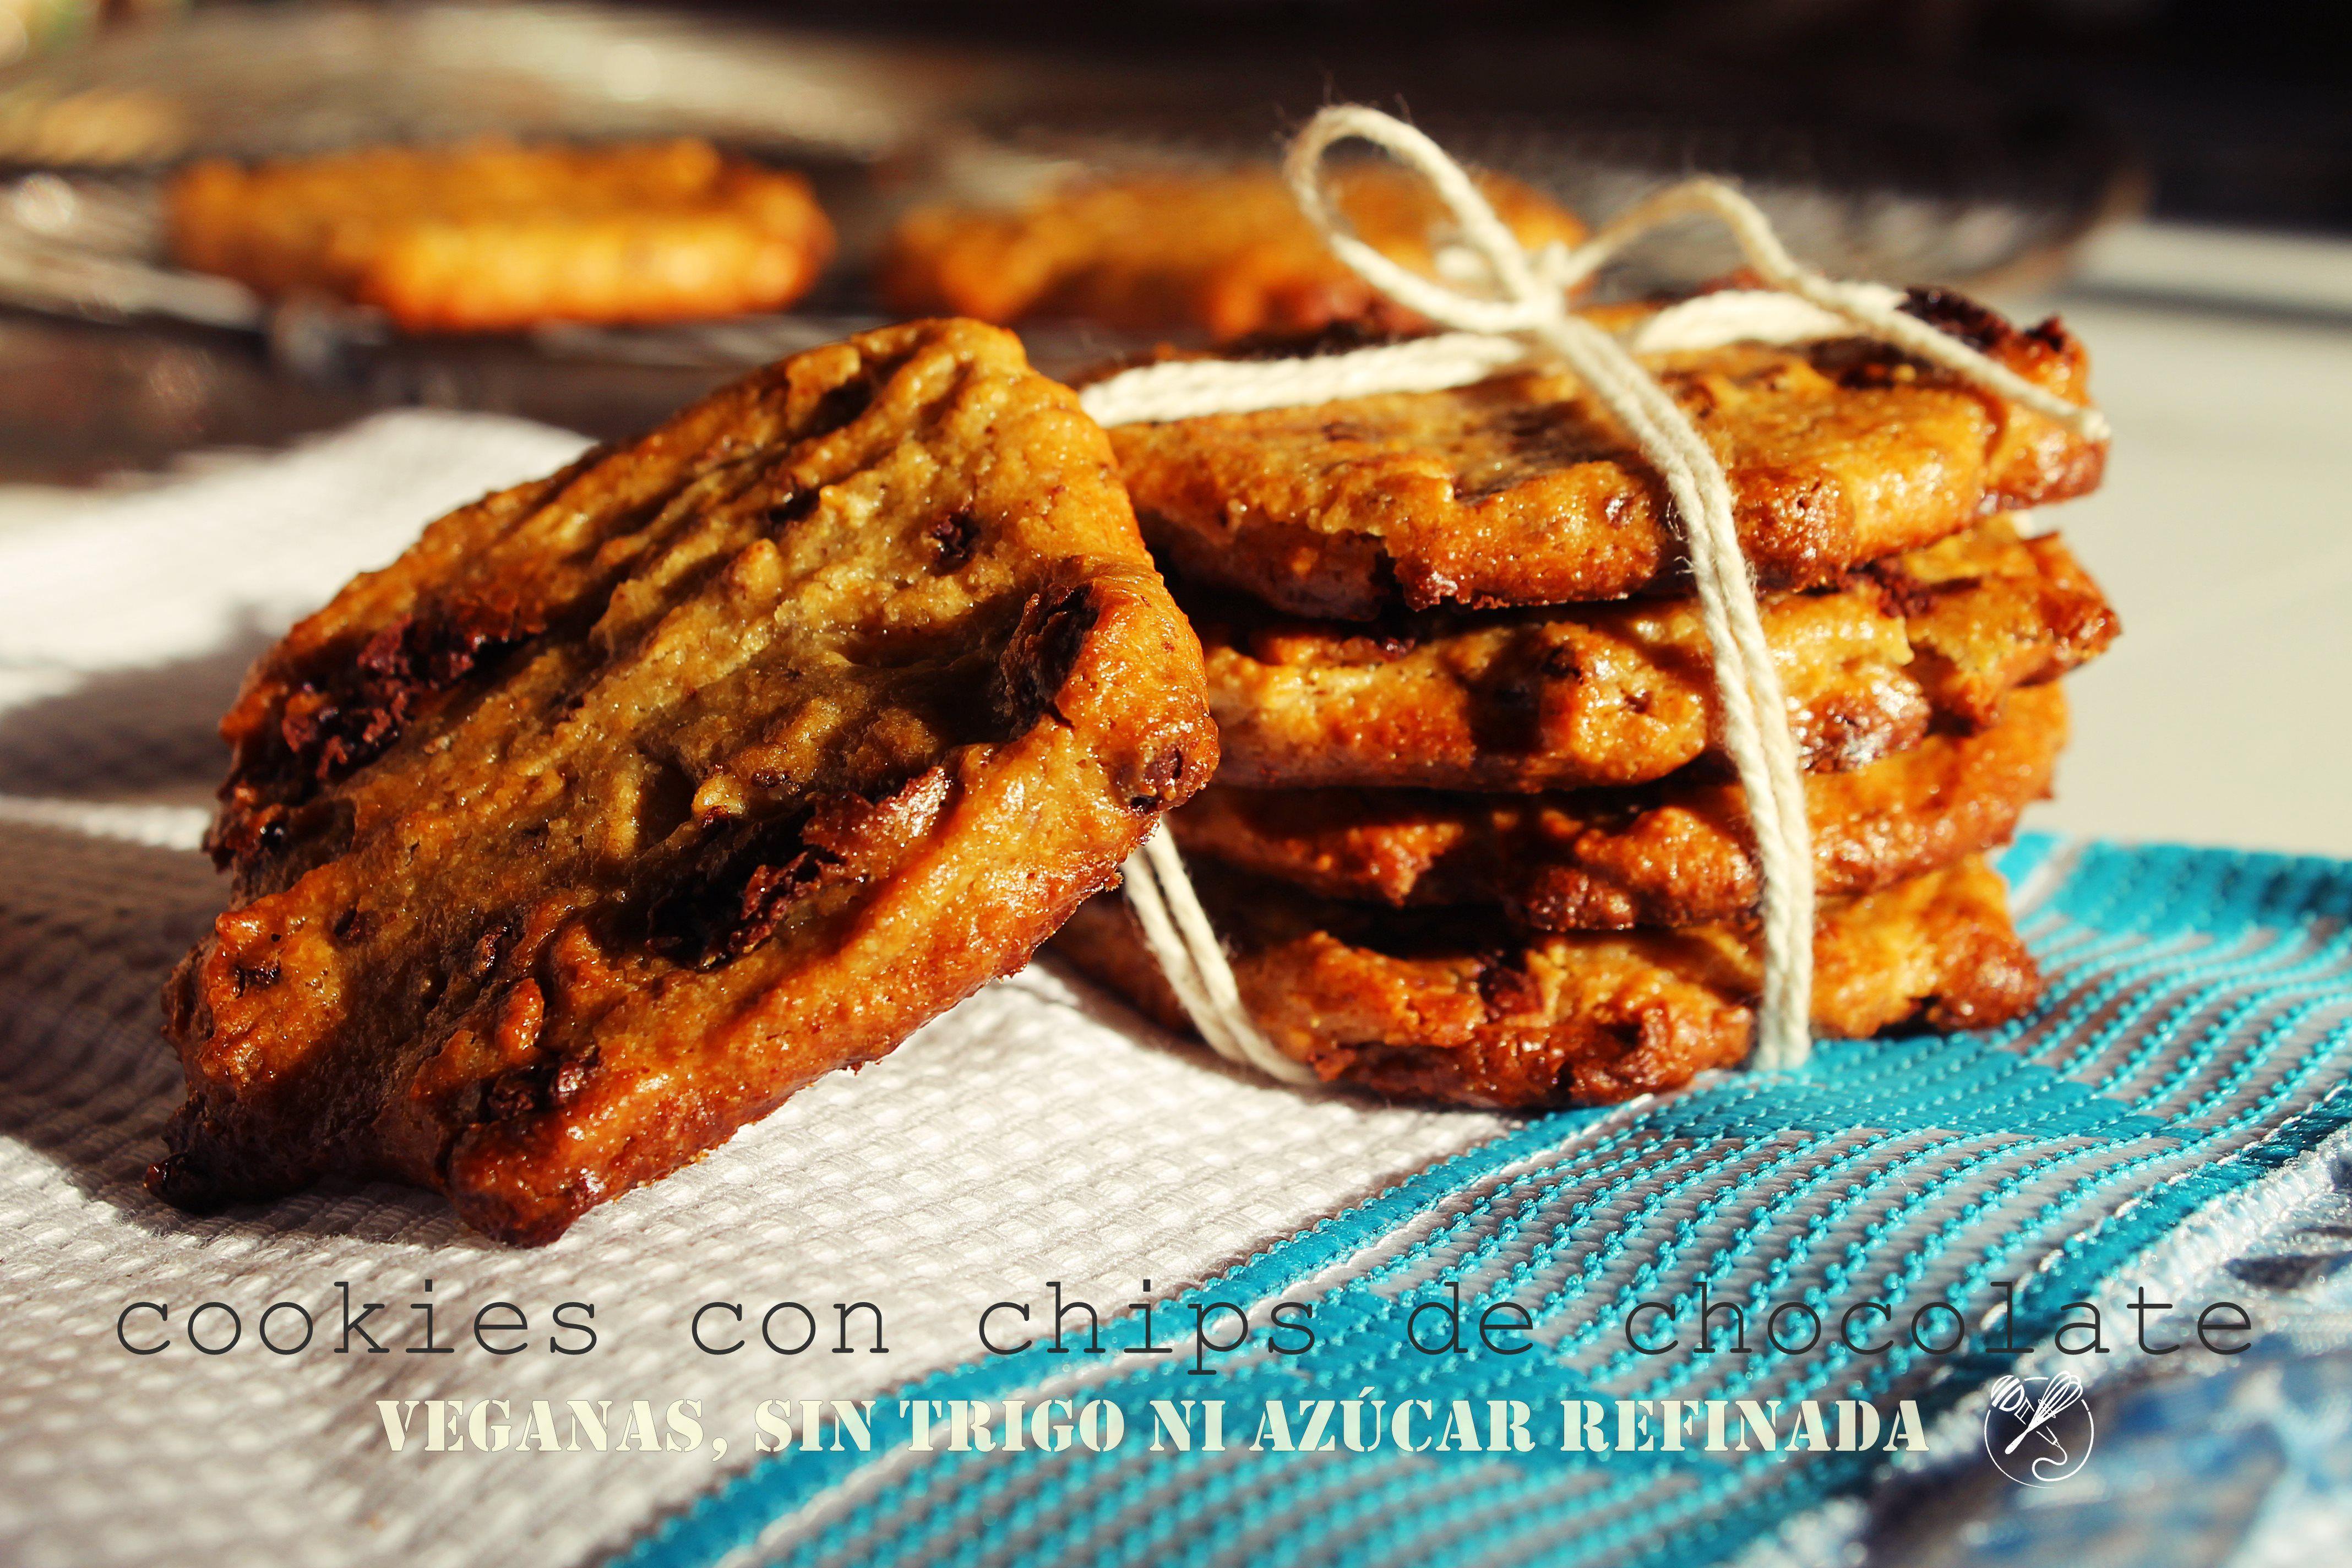 vegan, gluten-free, sugar-free chocolate chip cookies